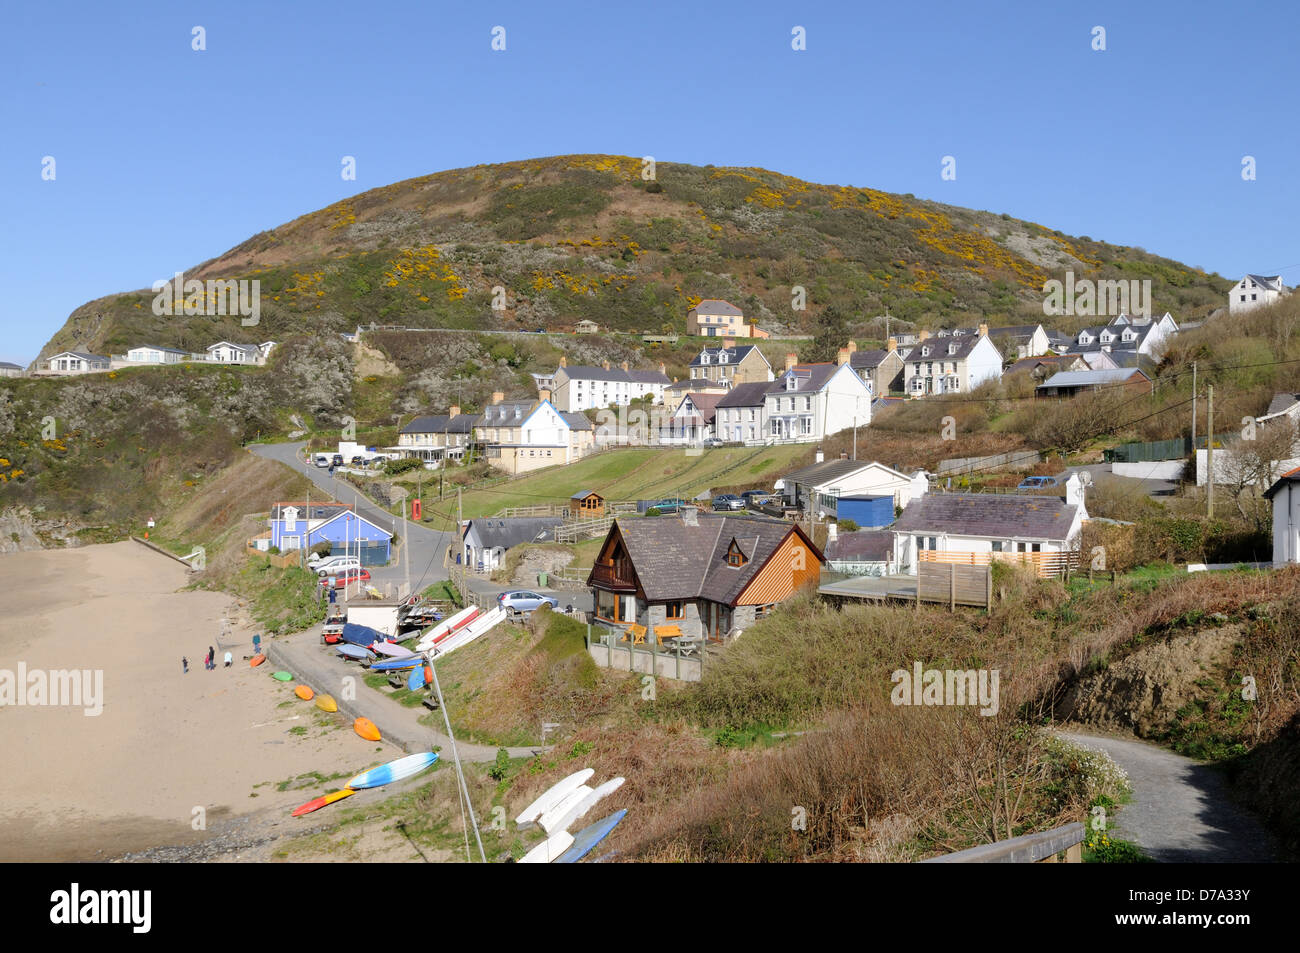 Tresaith village and beach Cardigan Bay Ceredigion Wales Cymru uK GB - Stock Image